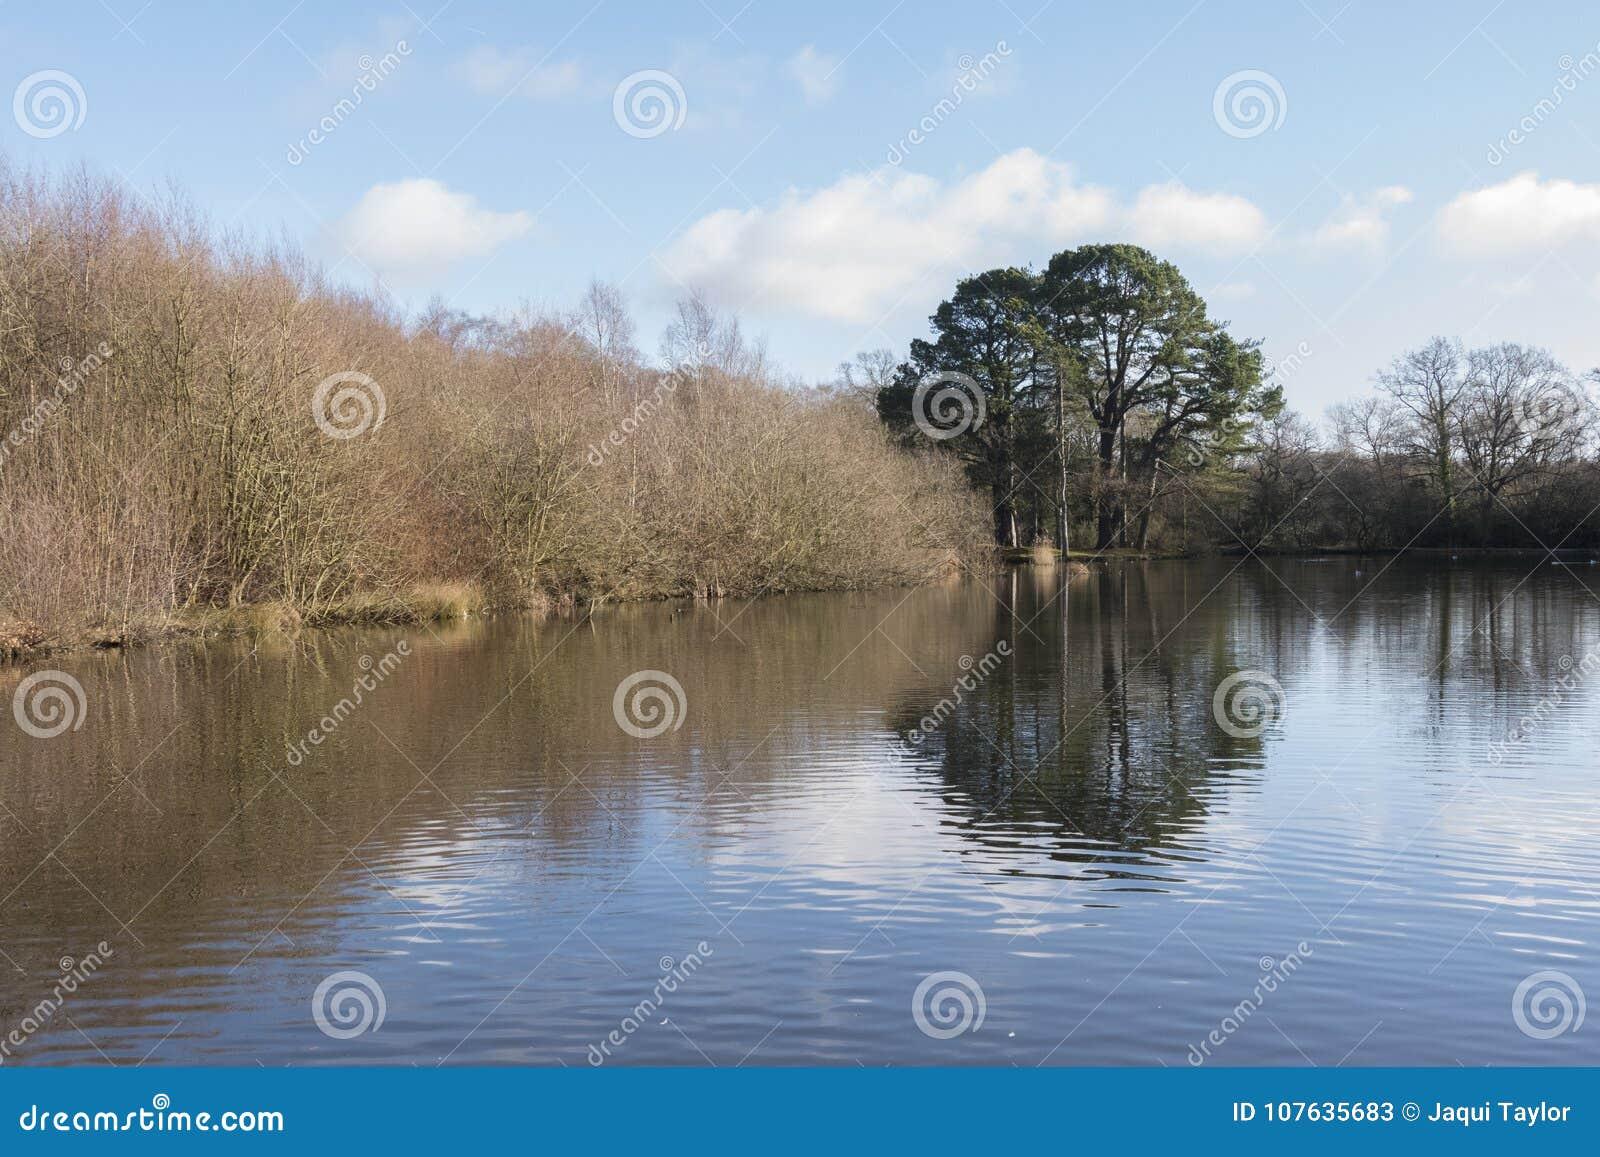 The Ornamental Pond, Southampton Common